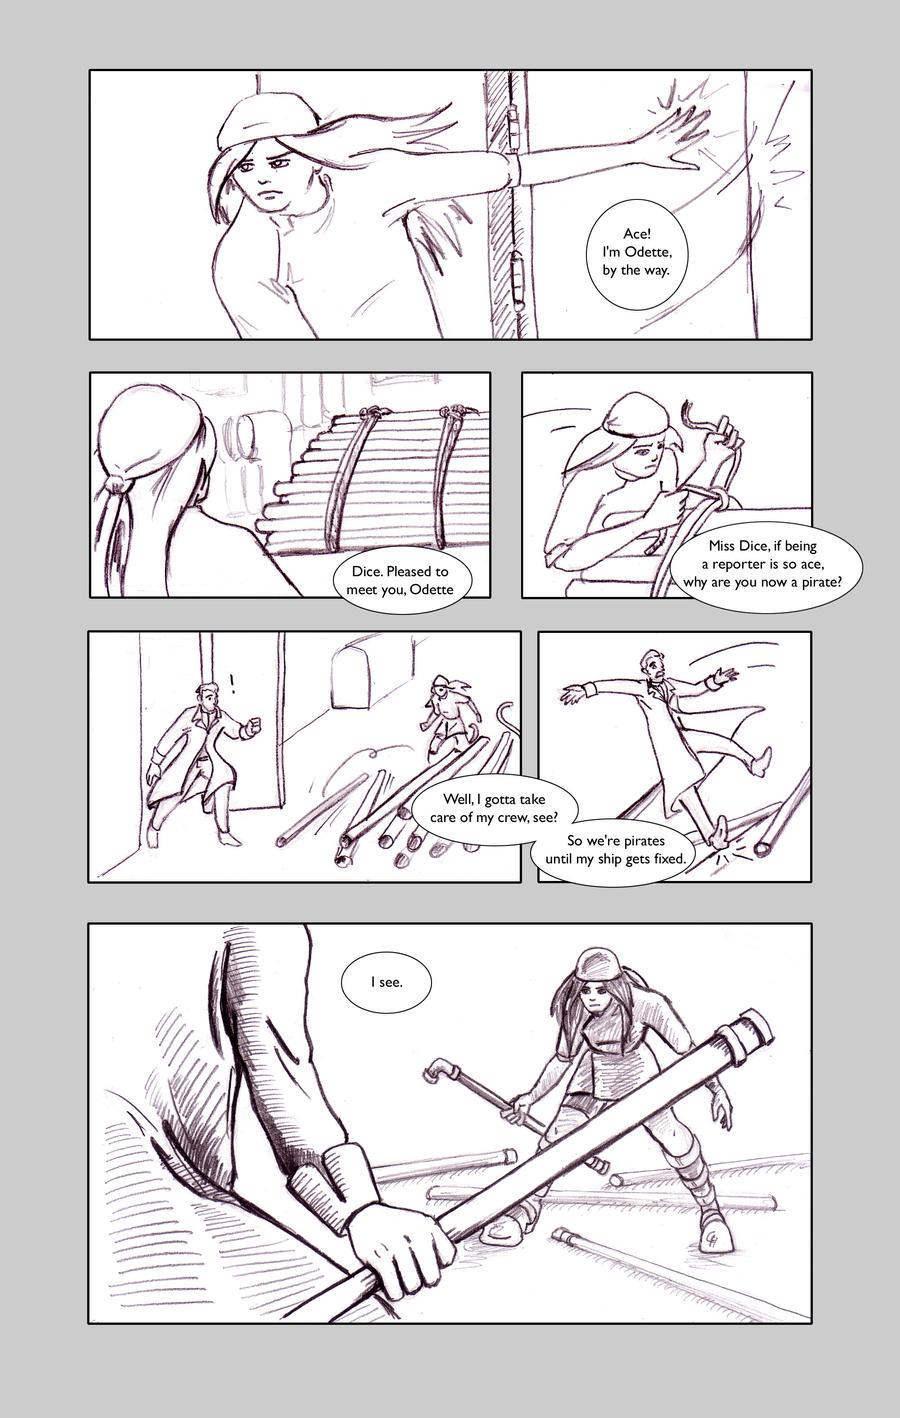 rogue Skies: Round 1, Page 9 by greymattre